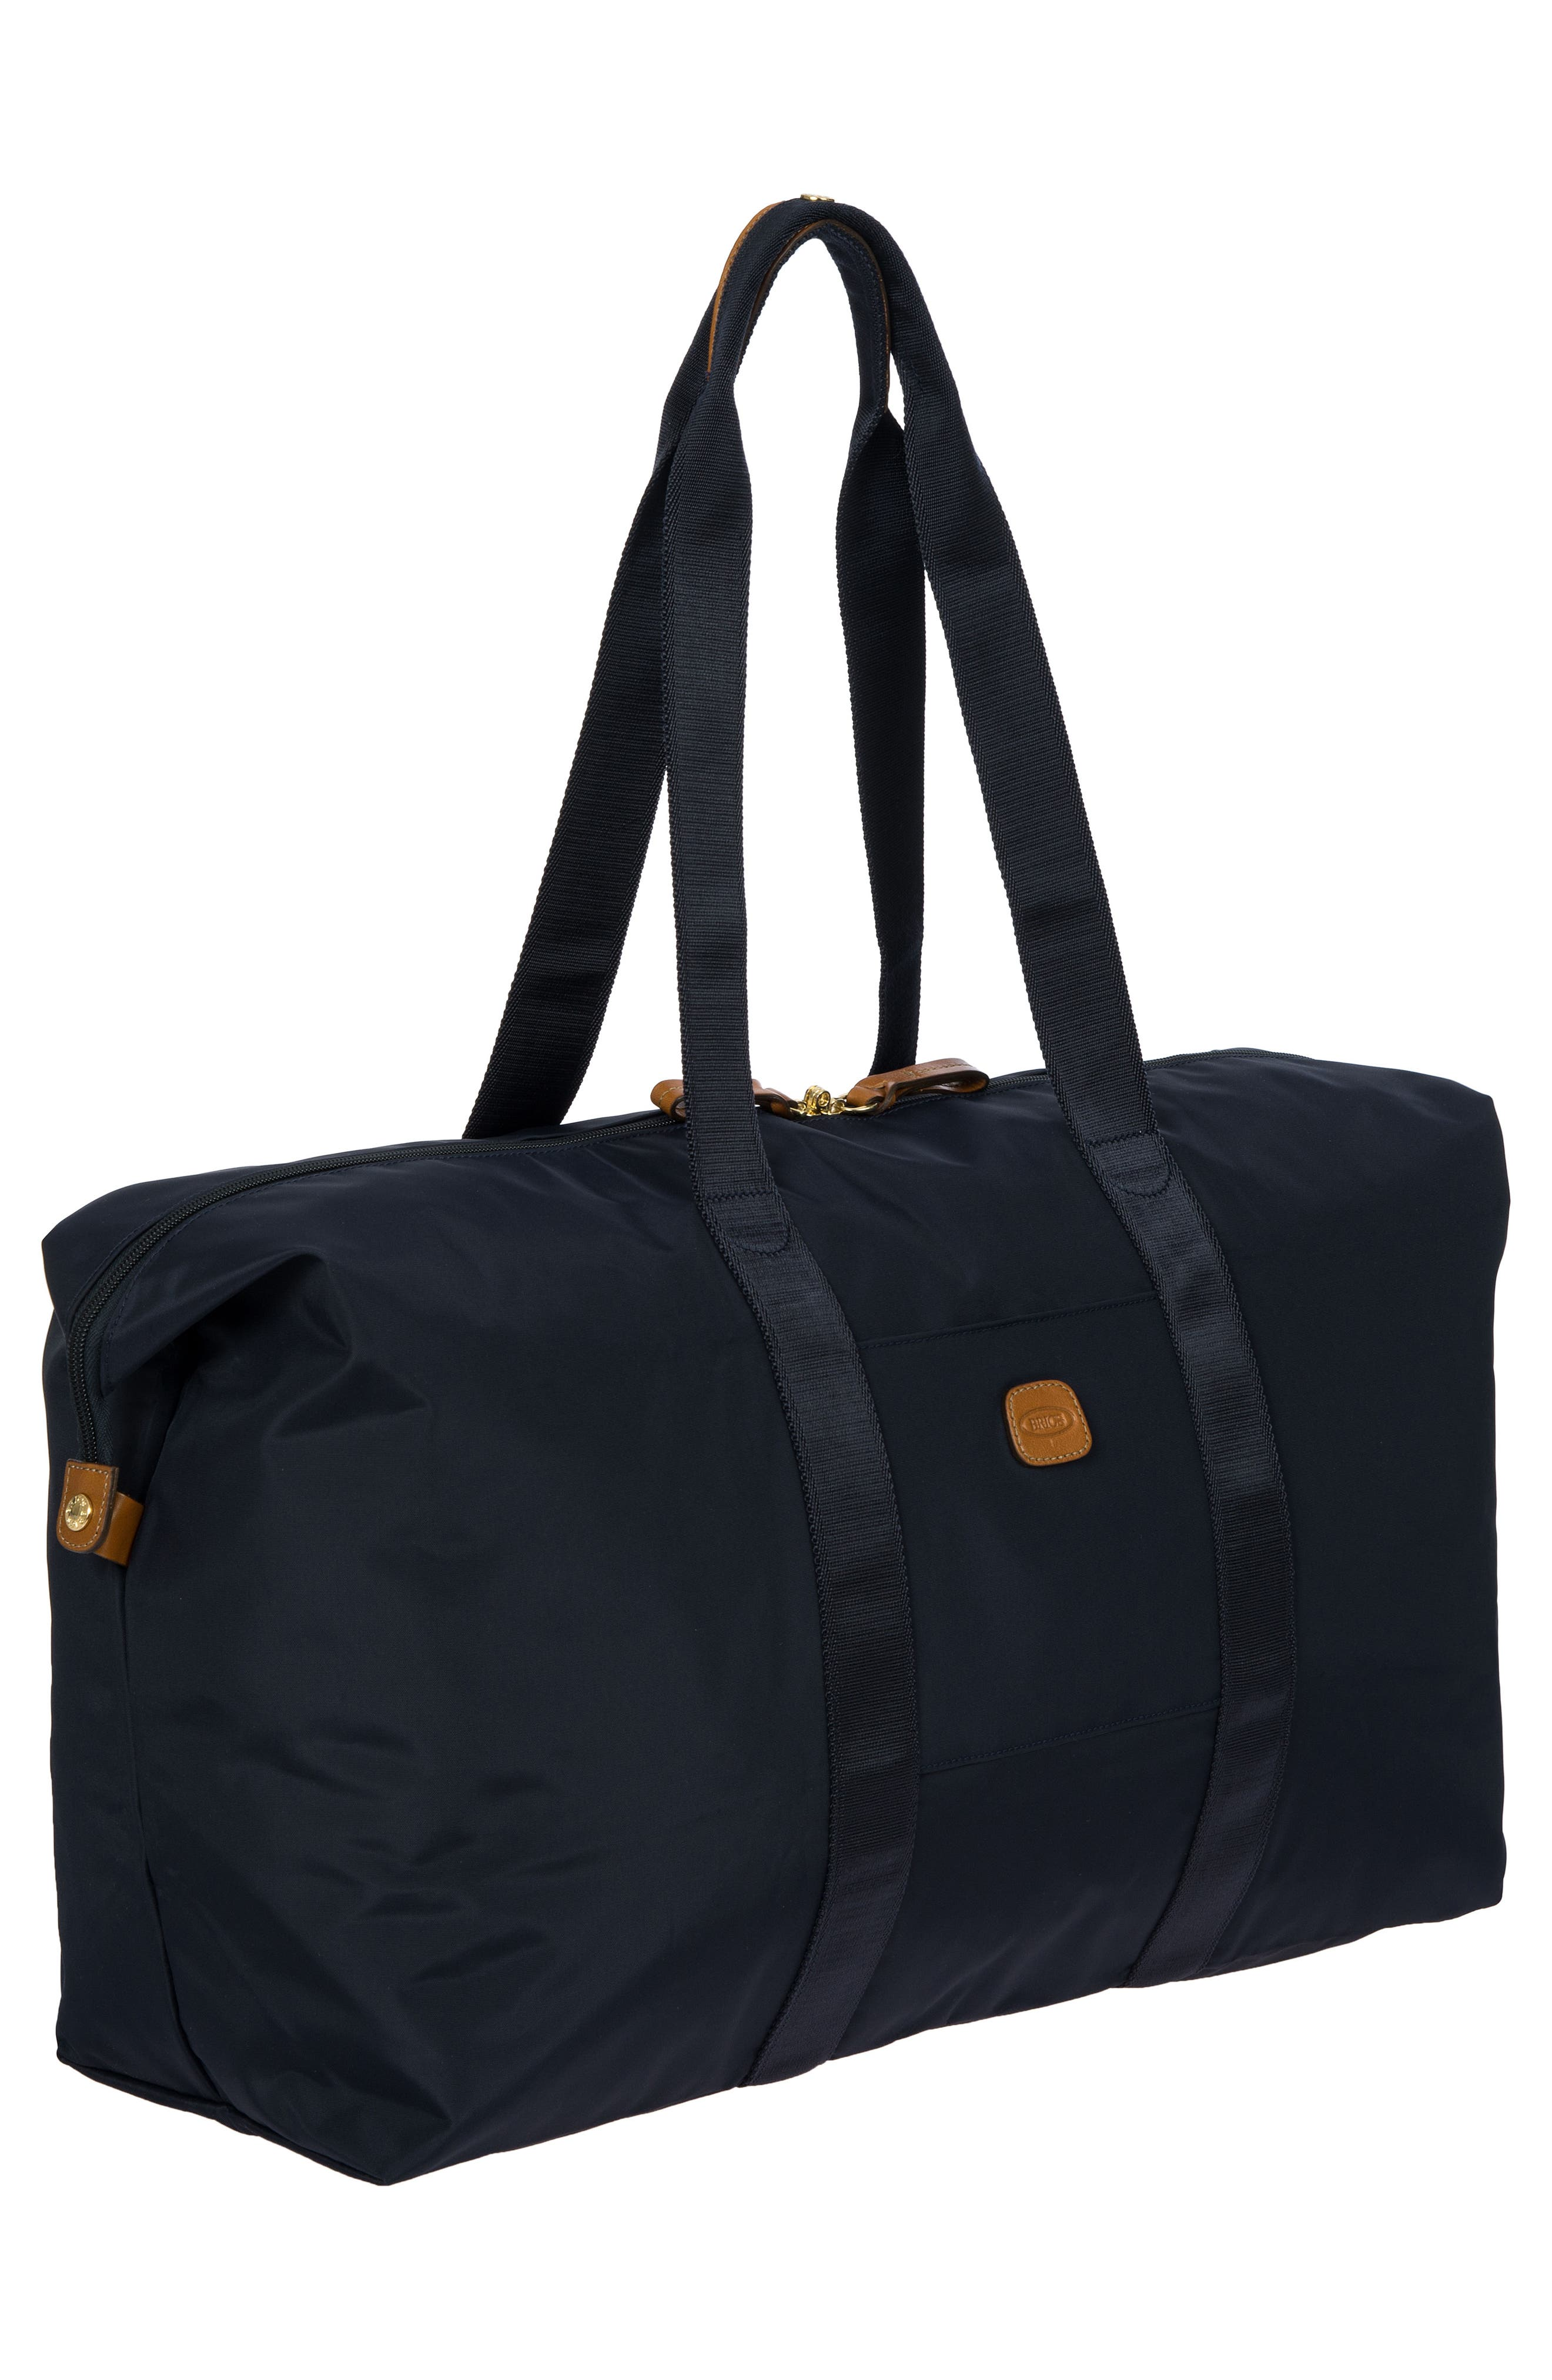 X-Bag 22-Inch Folding Duffel Bag,                             Alternate thumbnail 4, color,                             NAVY